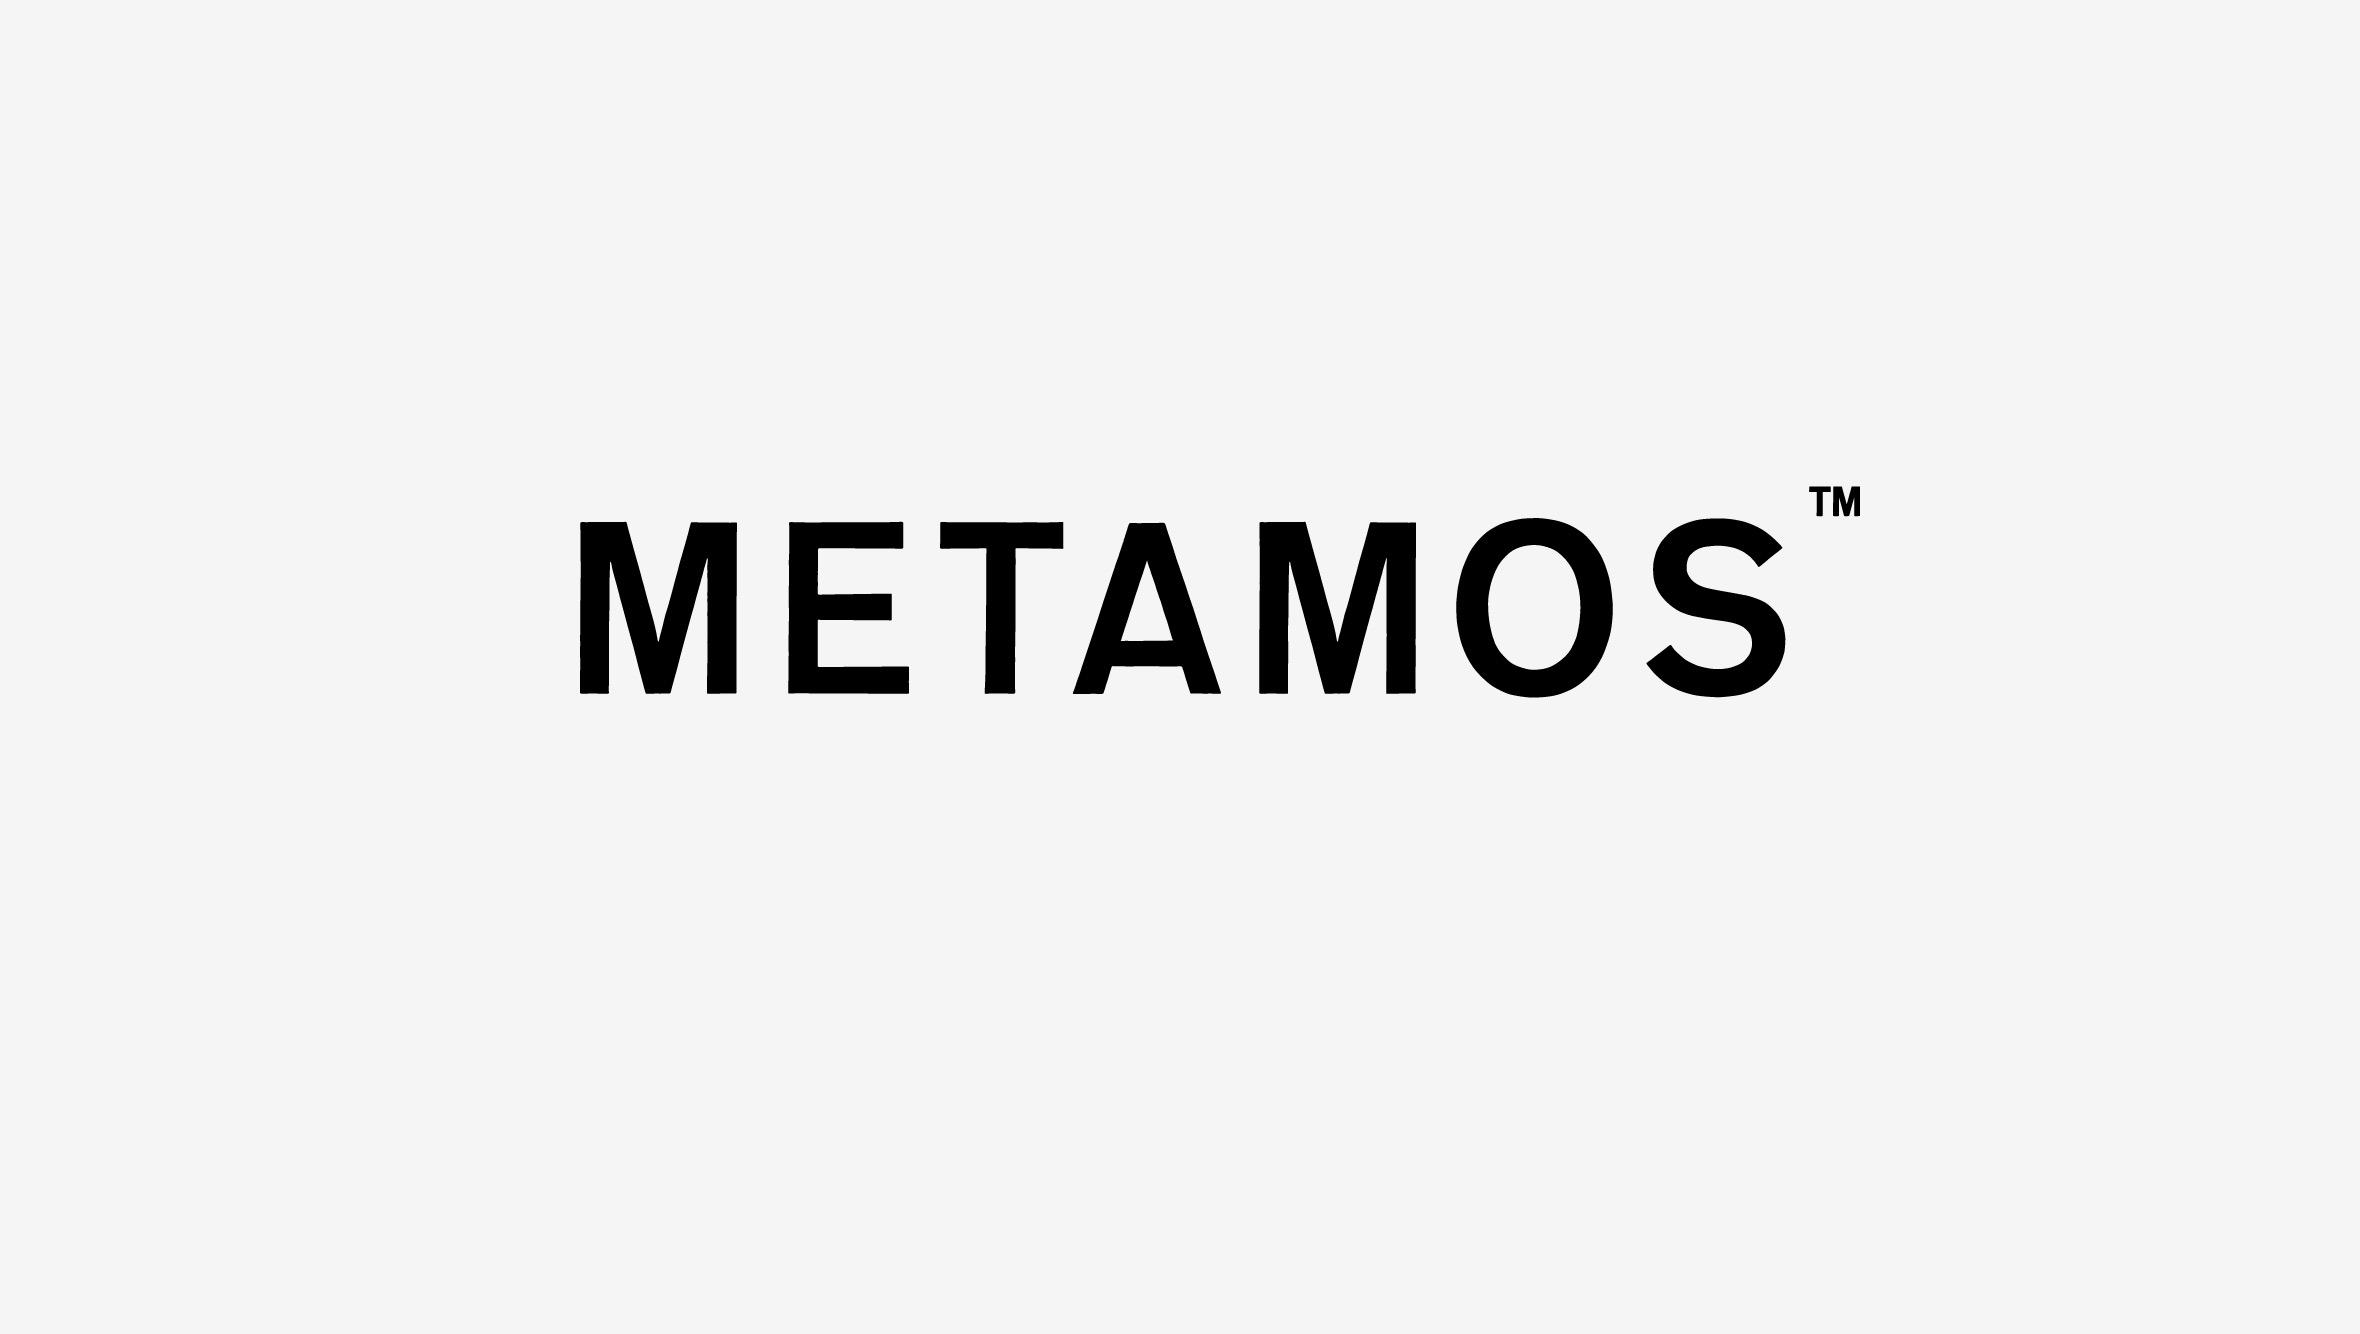 METAMOS™